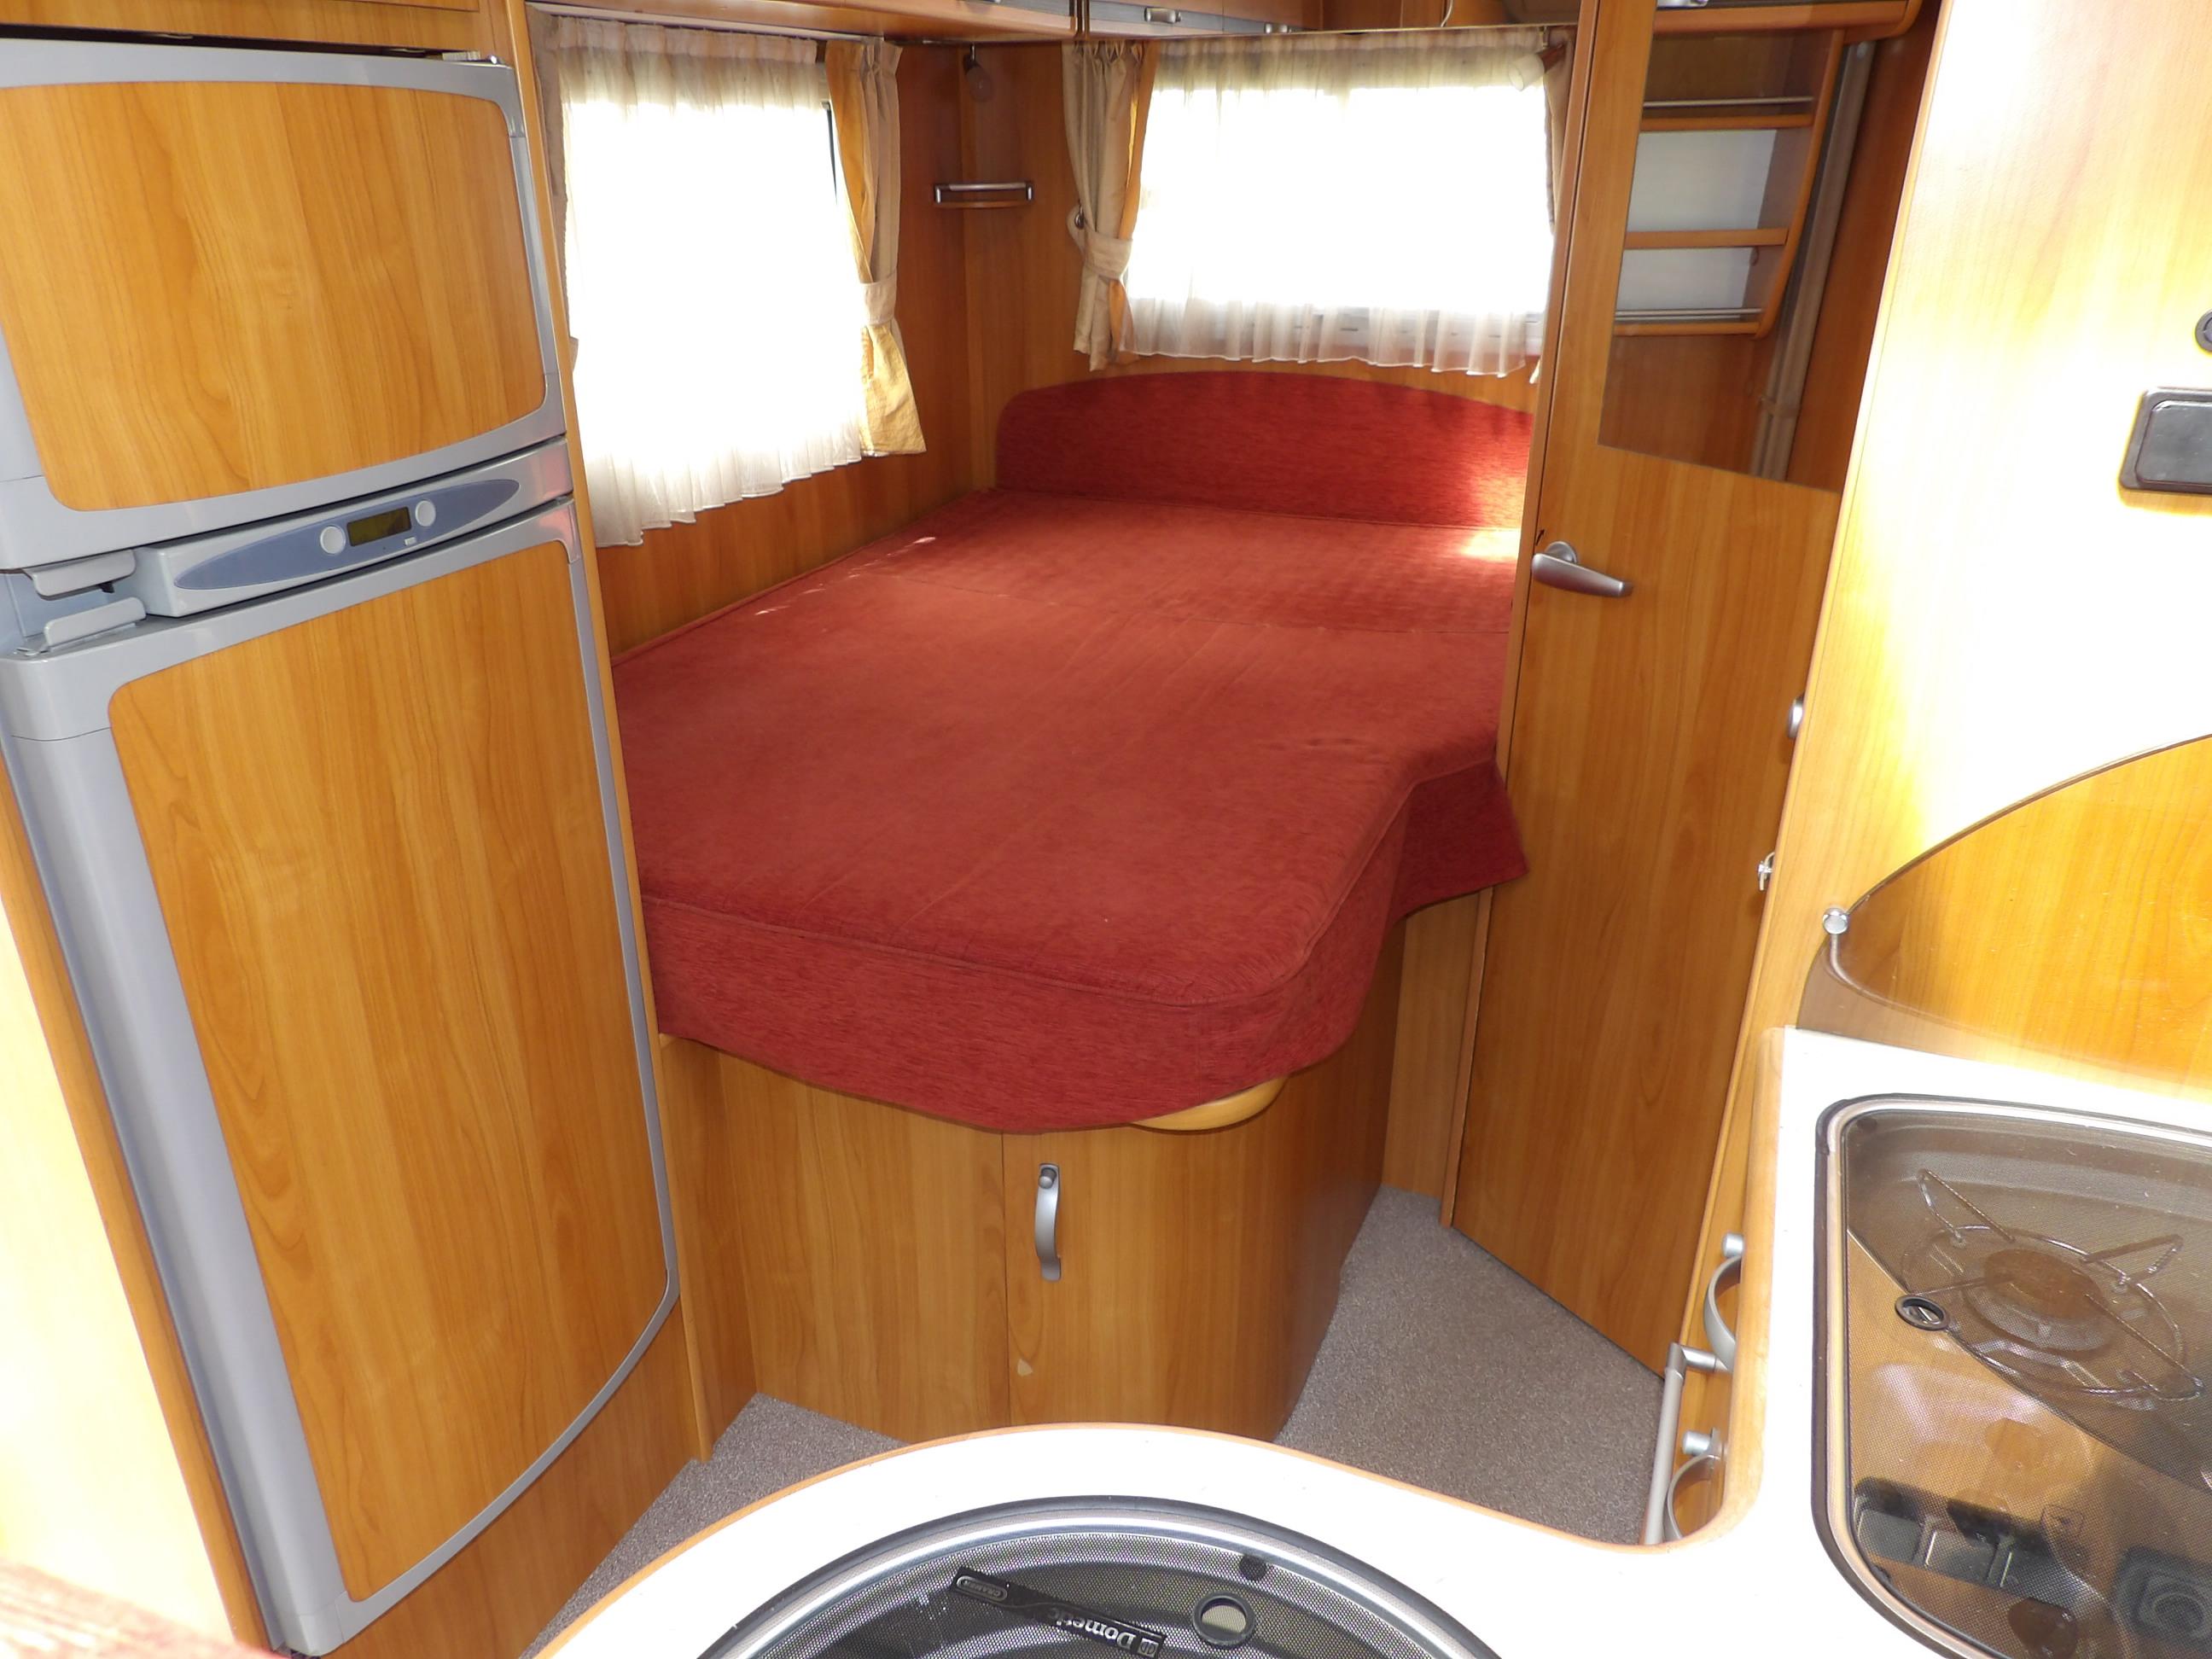 autostar auros 80 occasion de 2008 fiat camping car en vente locoal mendon sortie 36. Black Bedroom Furniture Sets. Home Design Ideas